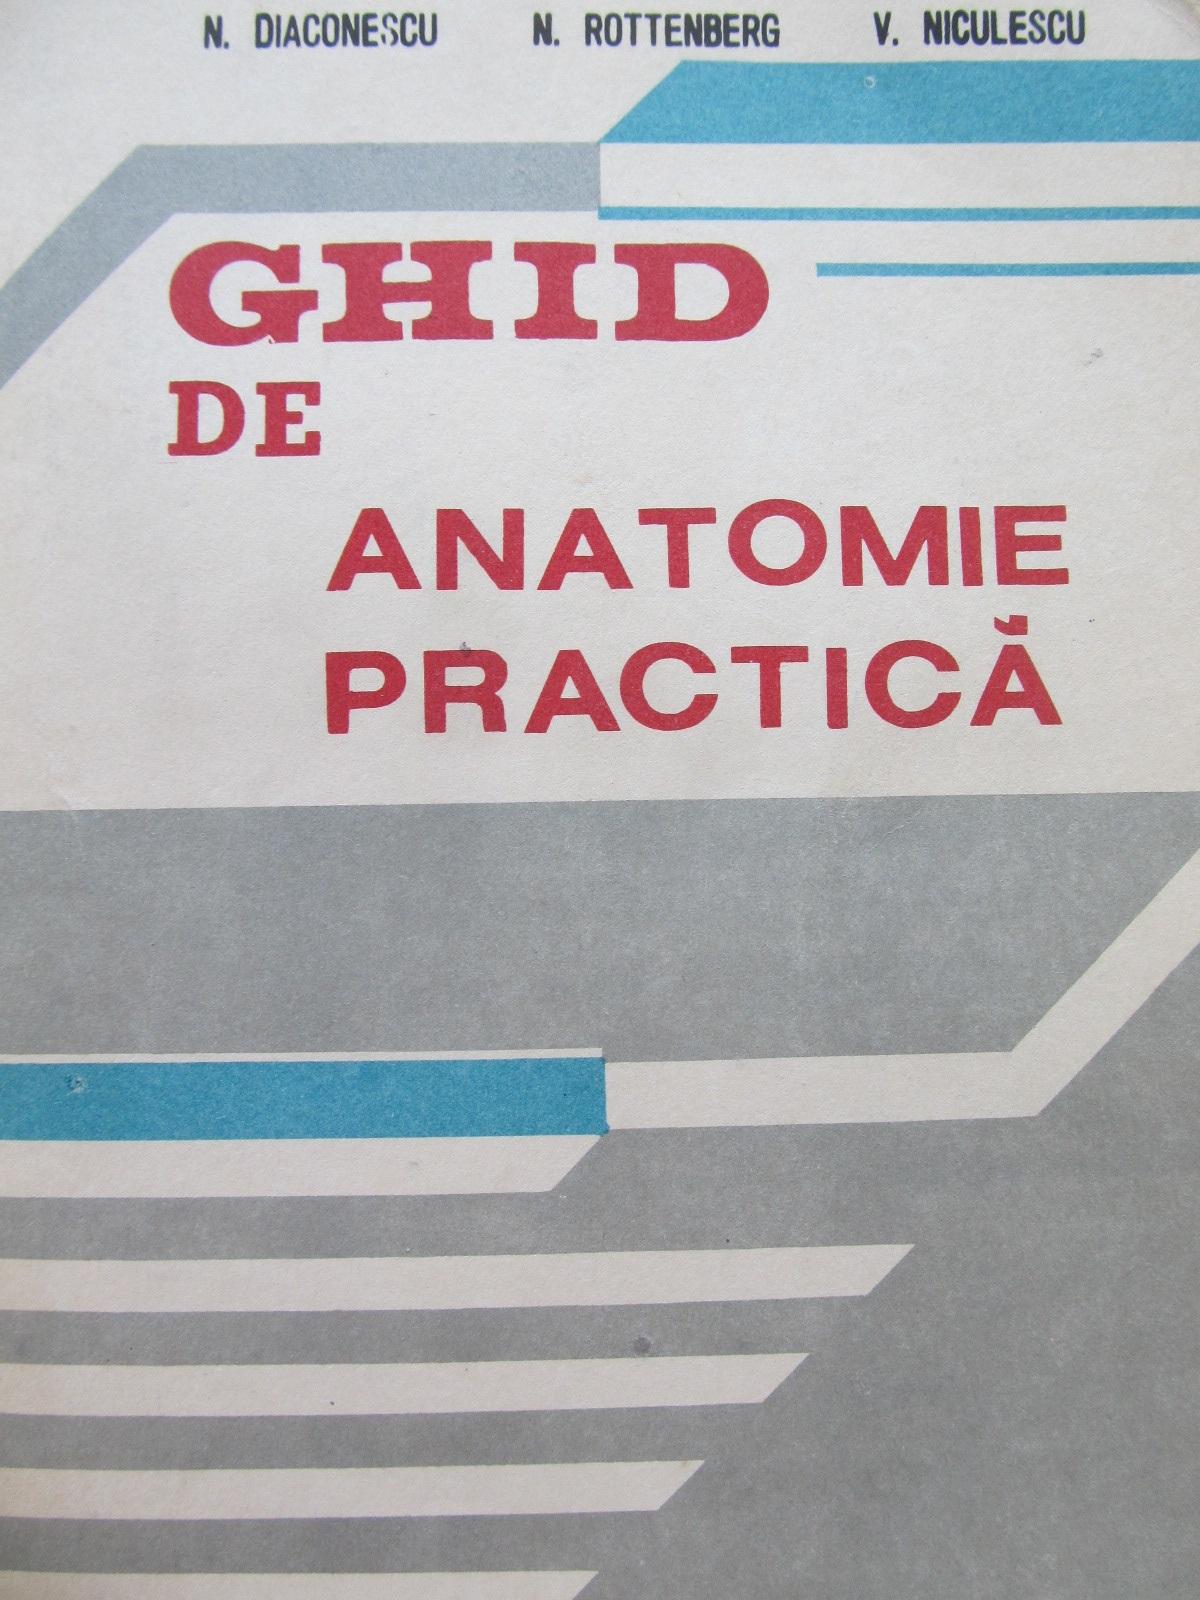 Ghid de anatomie practica - N. Diaconescu , N. Rottenberg , .. | Detalii carte